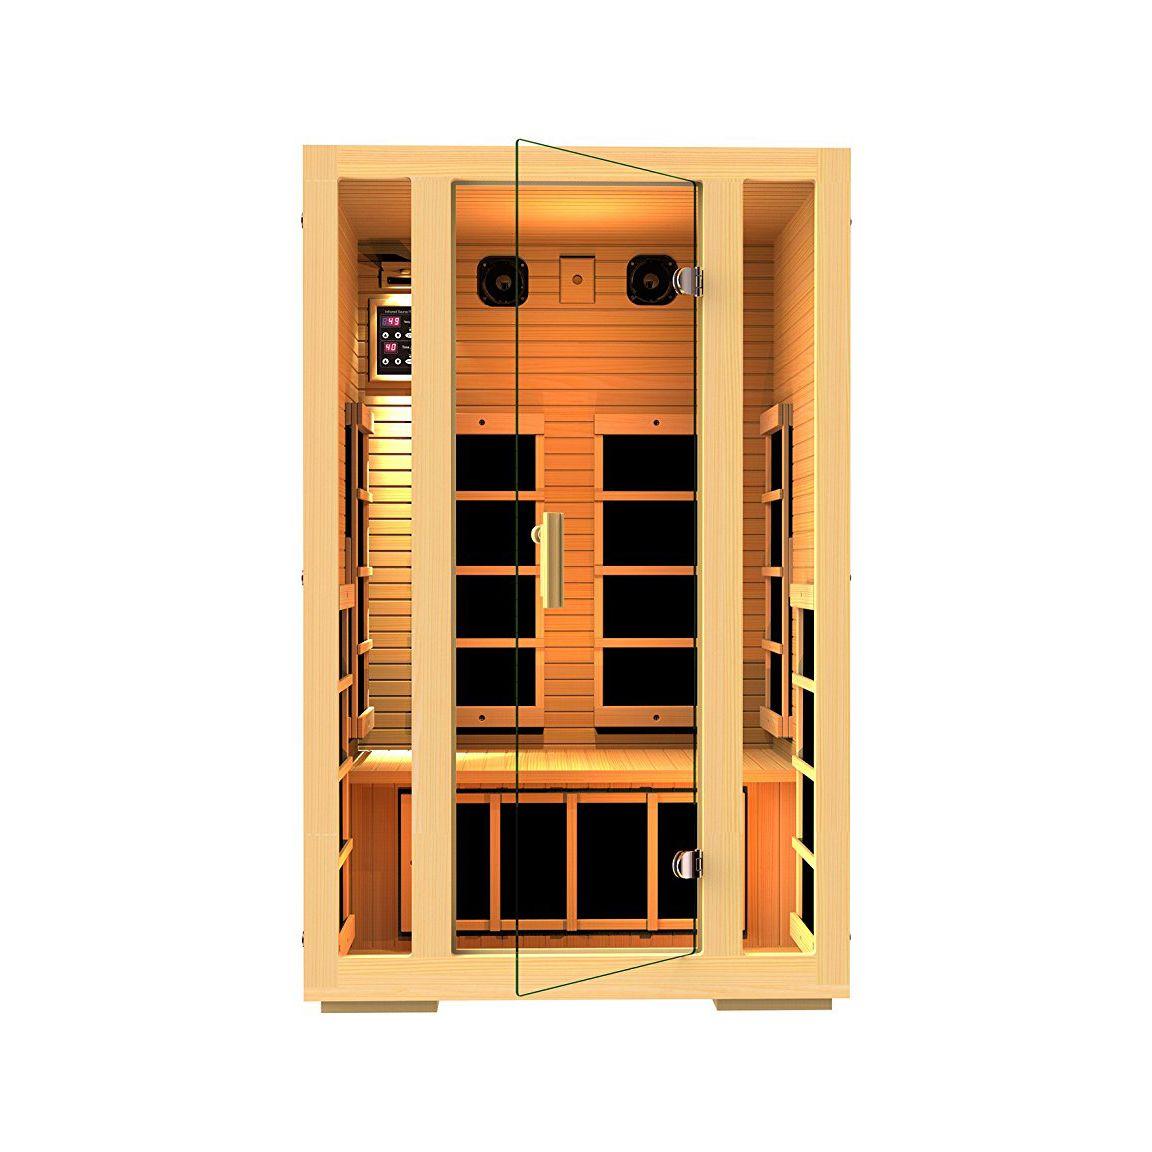 Home Sauna Kits Since 1974 joyous 2-person sauna